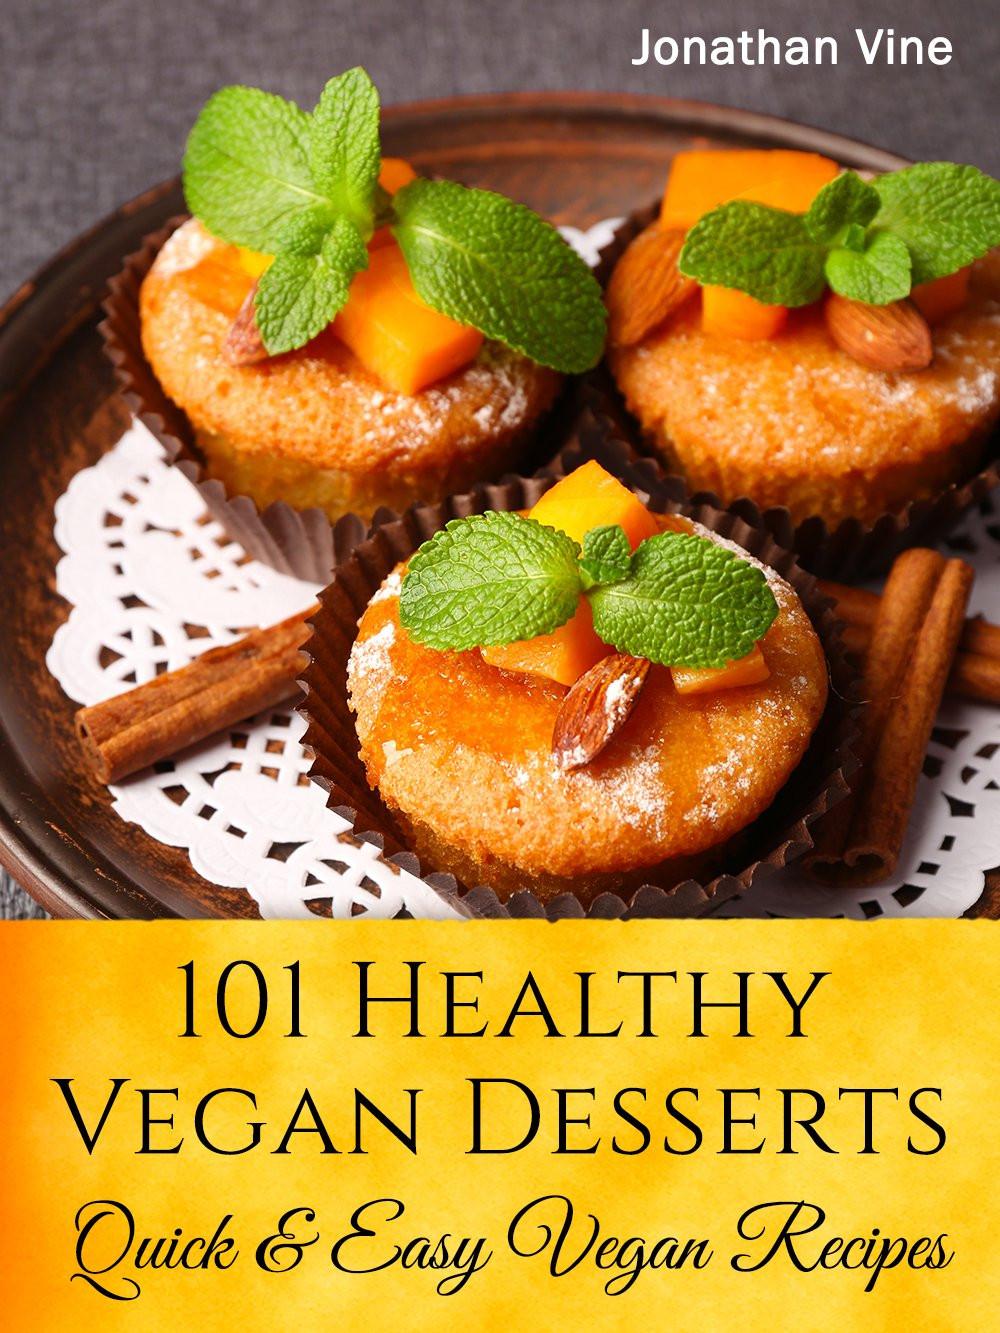 Healthy Dessert Ideas For Weight Loss  Healty Recipes for Weight Loss for Dinner for Kids Tumblr